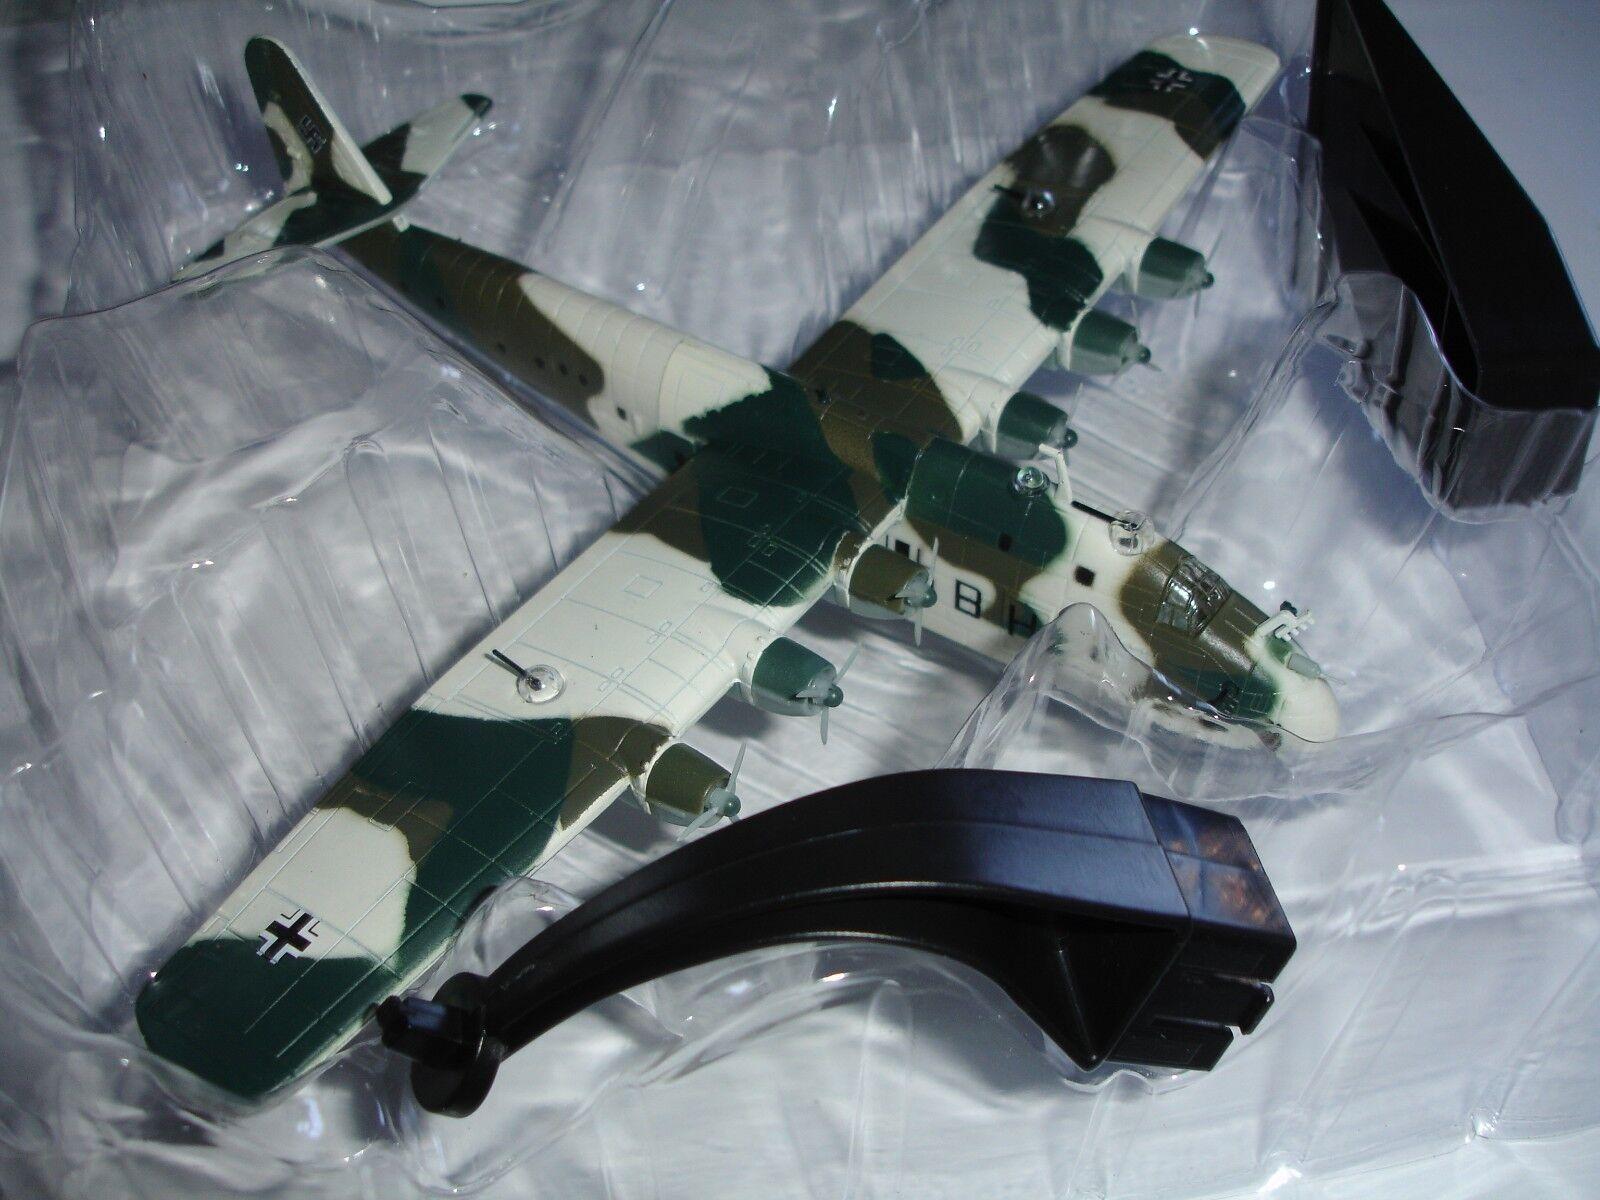 BLOHM UND VOSS BV 222 V2 WIKING,1944 1 200 200 200 SCALE DIE-CAST MODEL a945f7